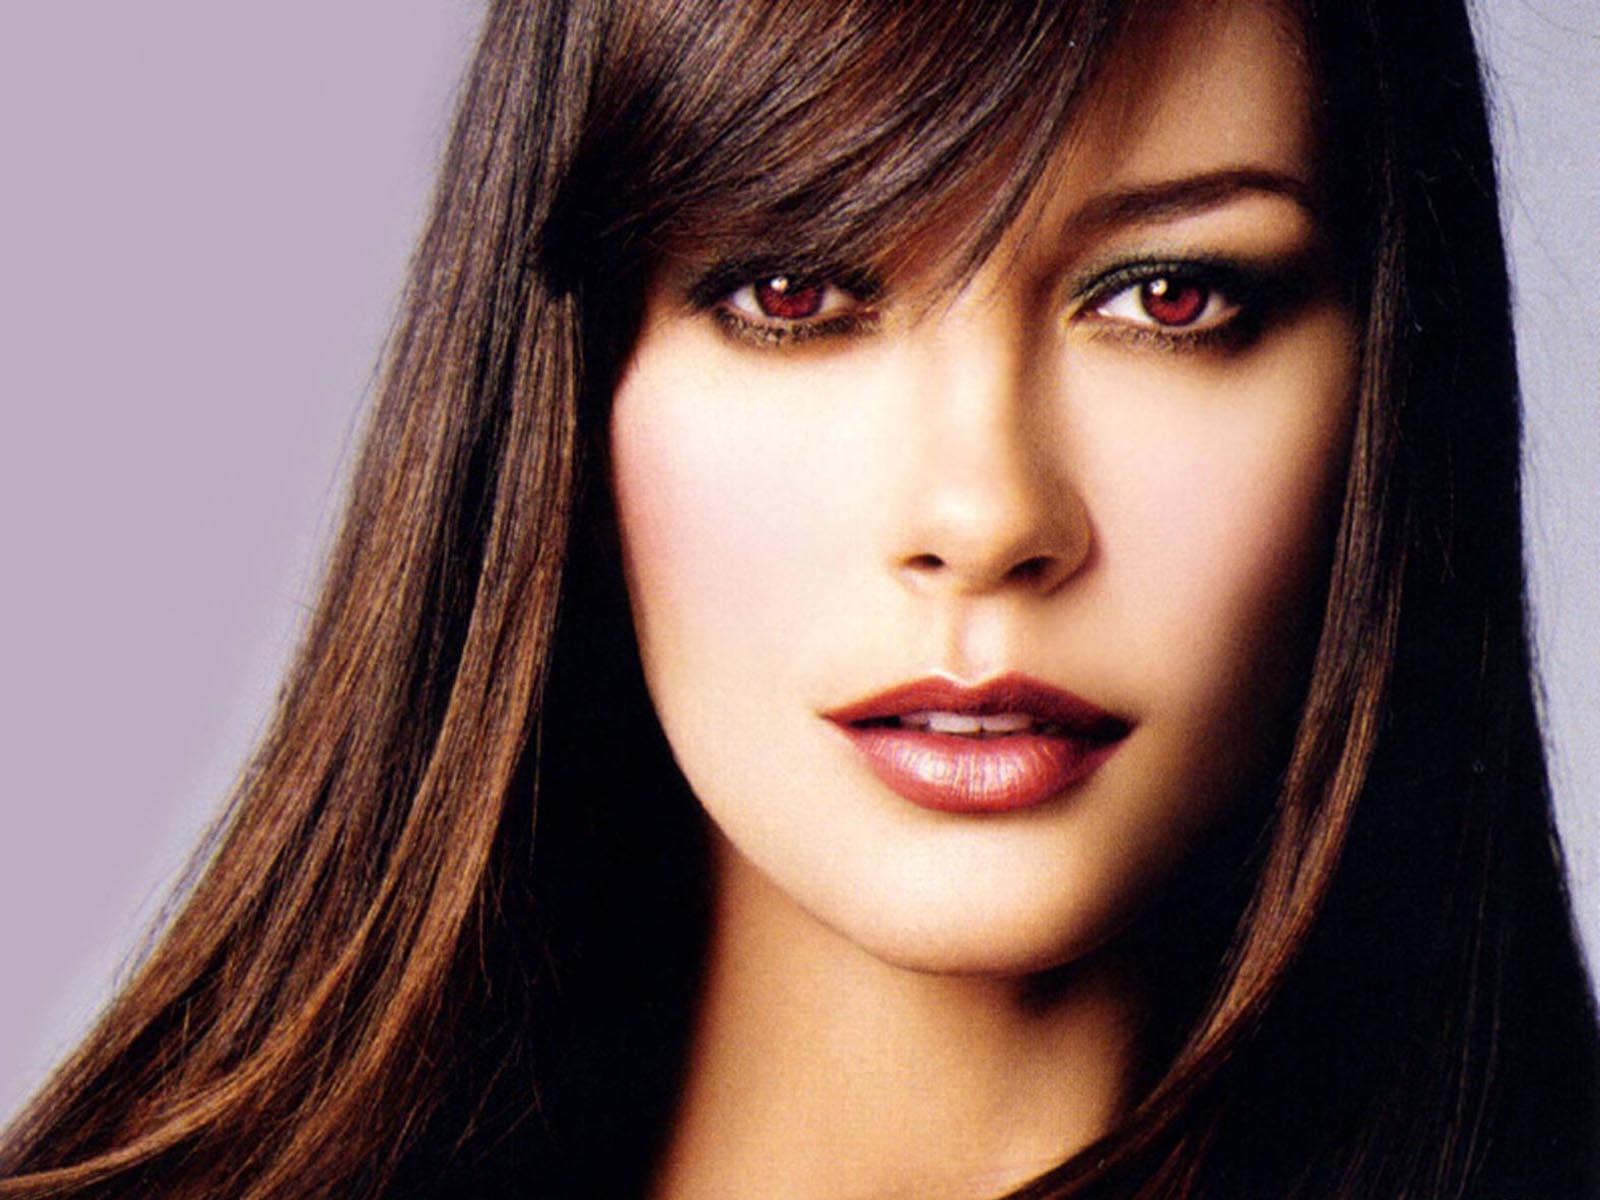 Ayub's Fashion Fusion: Long Hair and Beauty of Women